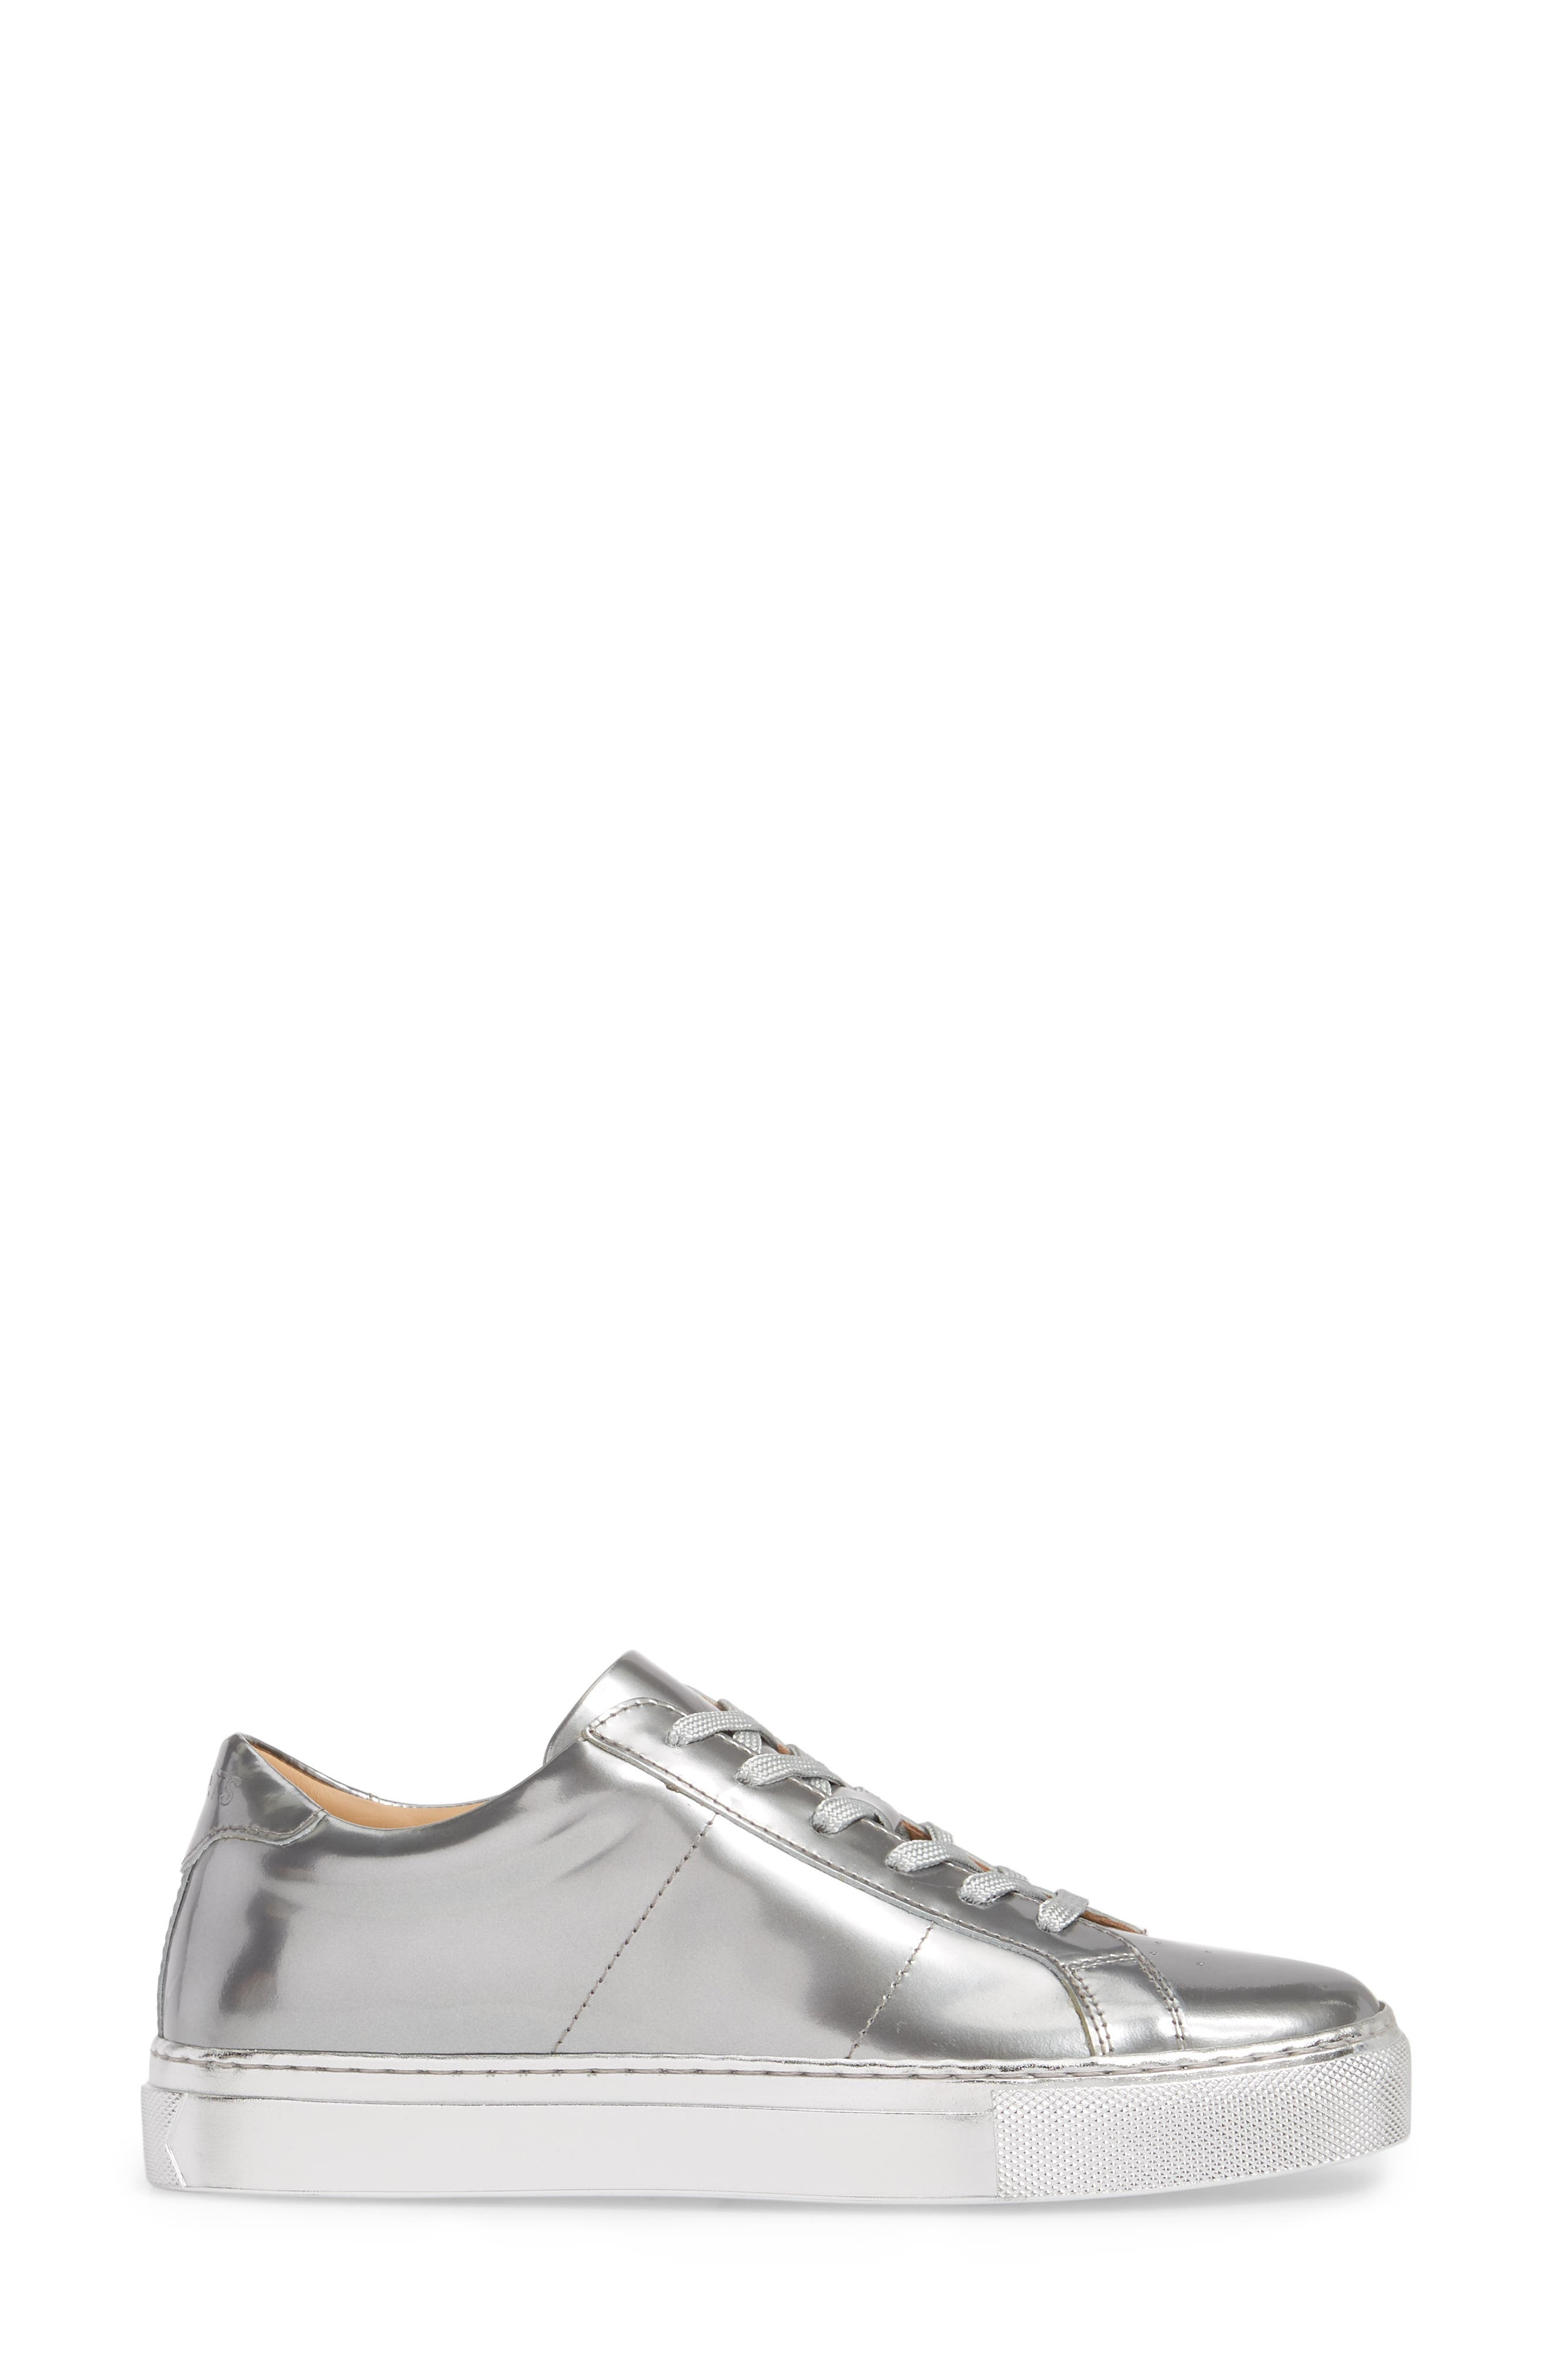 Royale Low Top Sneaker,                             Alternate thumbnail 3, color,                             Silver Tonal/ Flat Leather